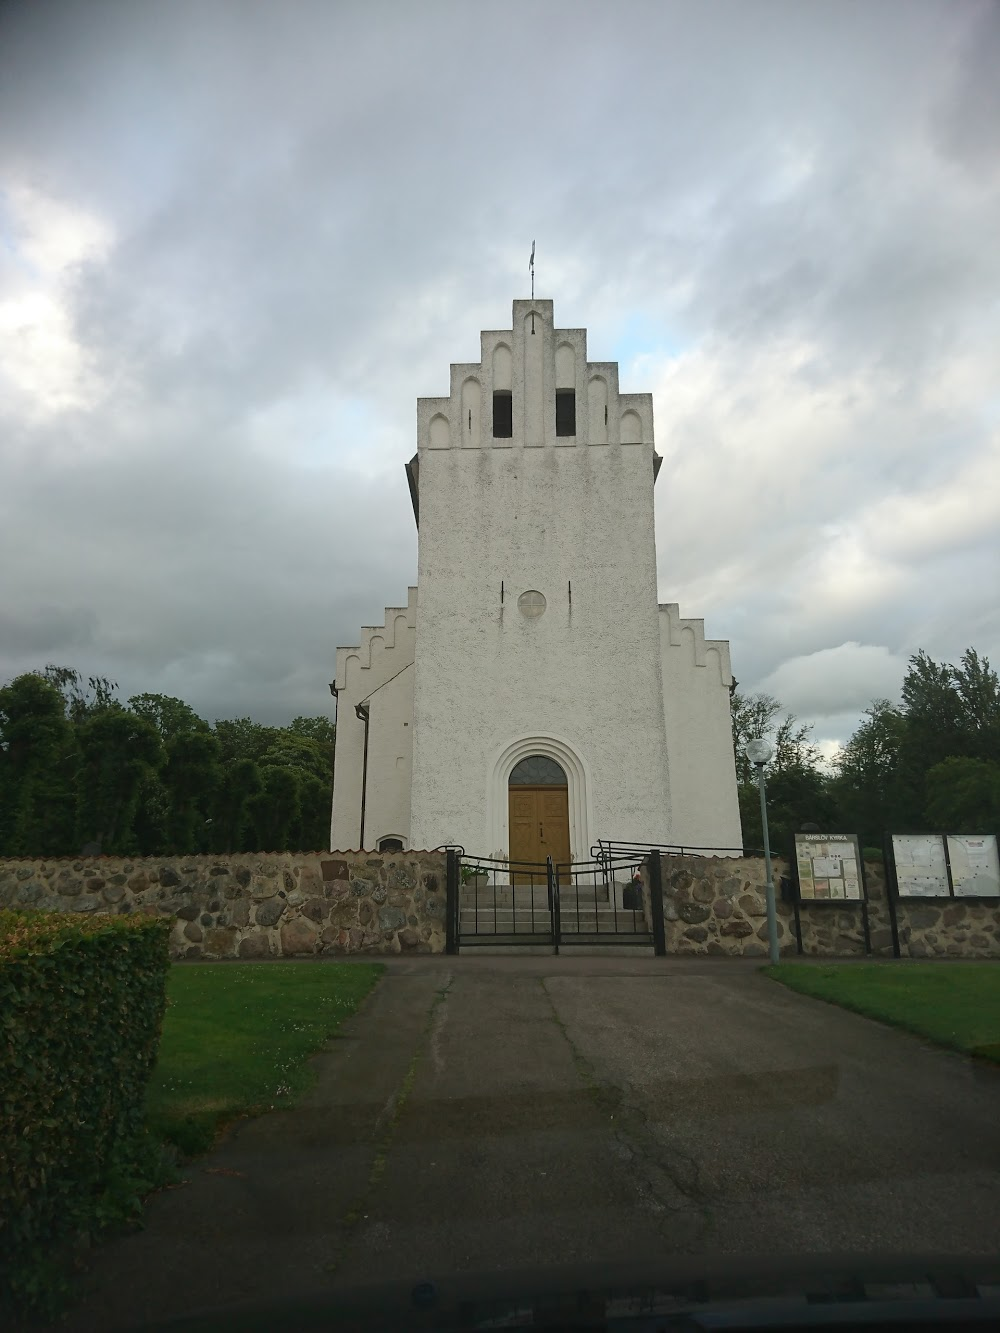 Frillestads Kyrkogård